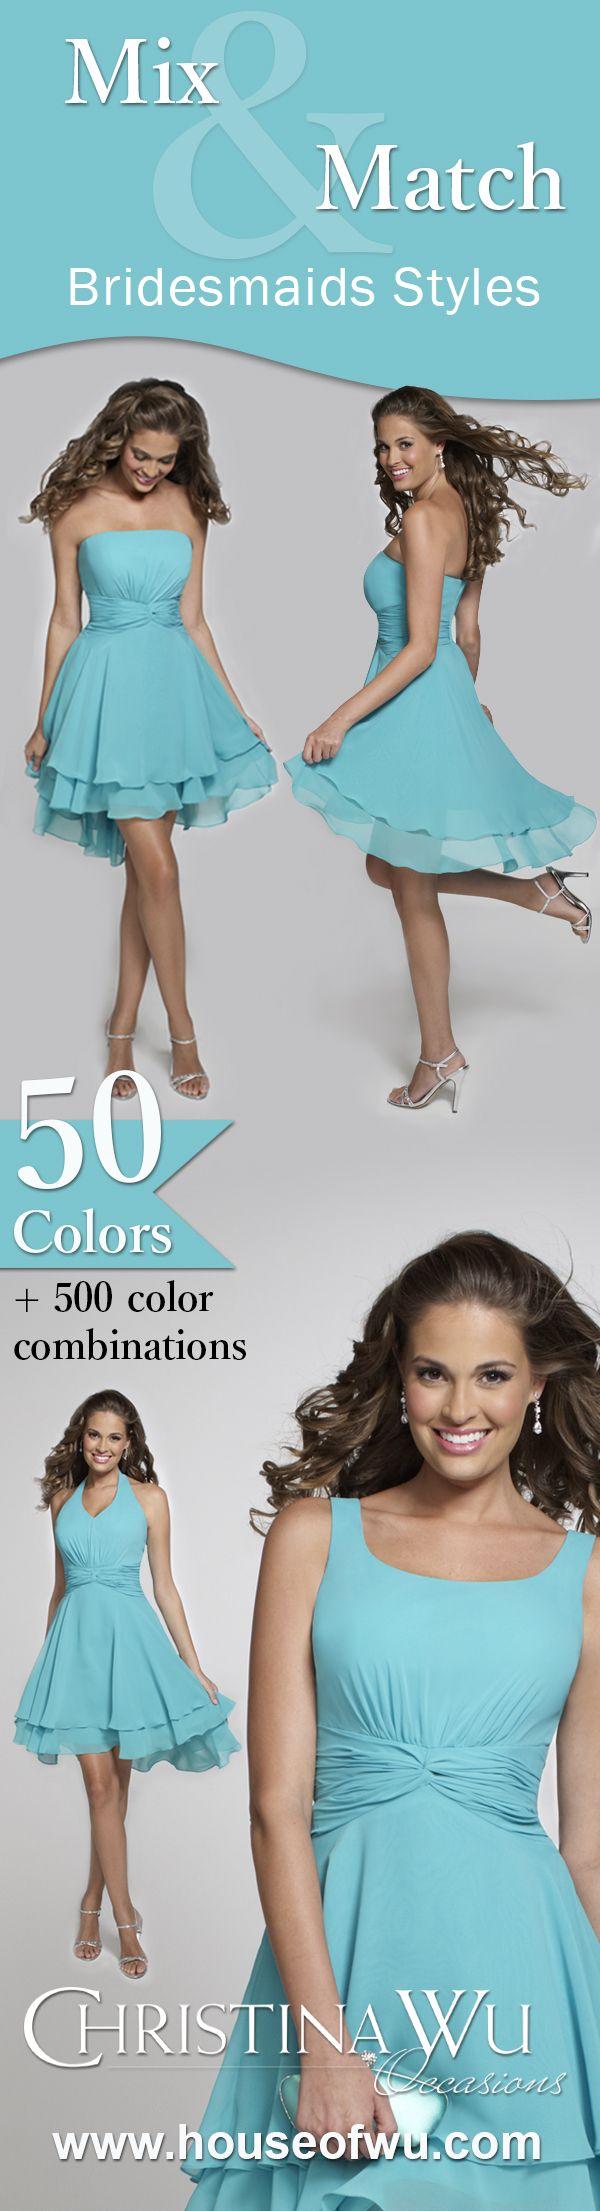 257 best Bridesmaid dresses images on Pinterest | Bridesmaids ...